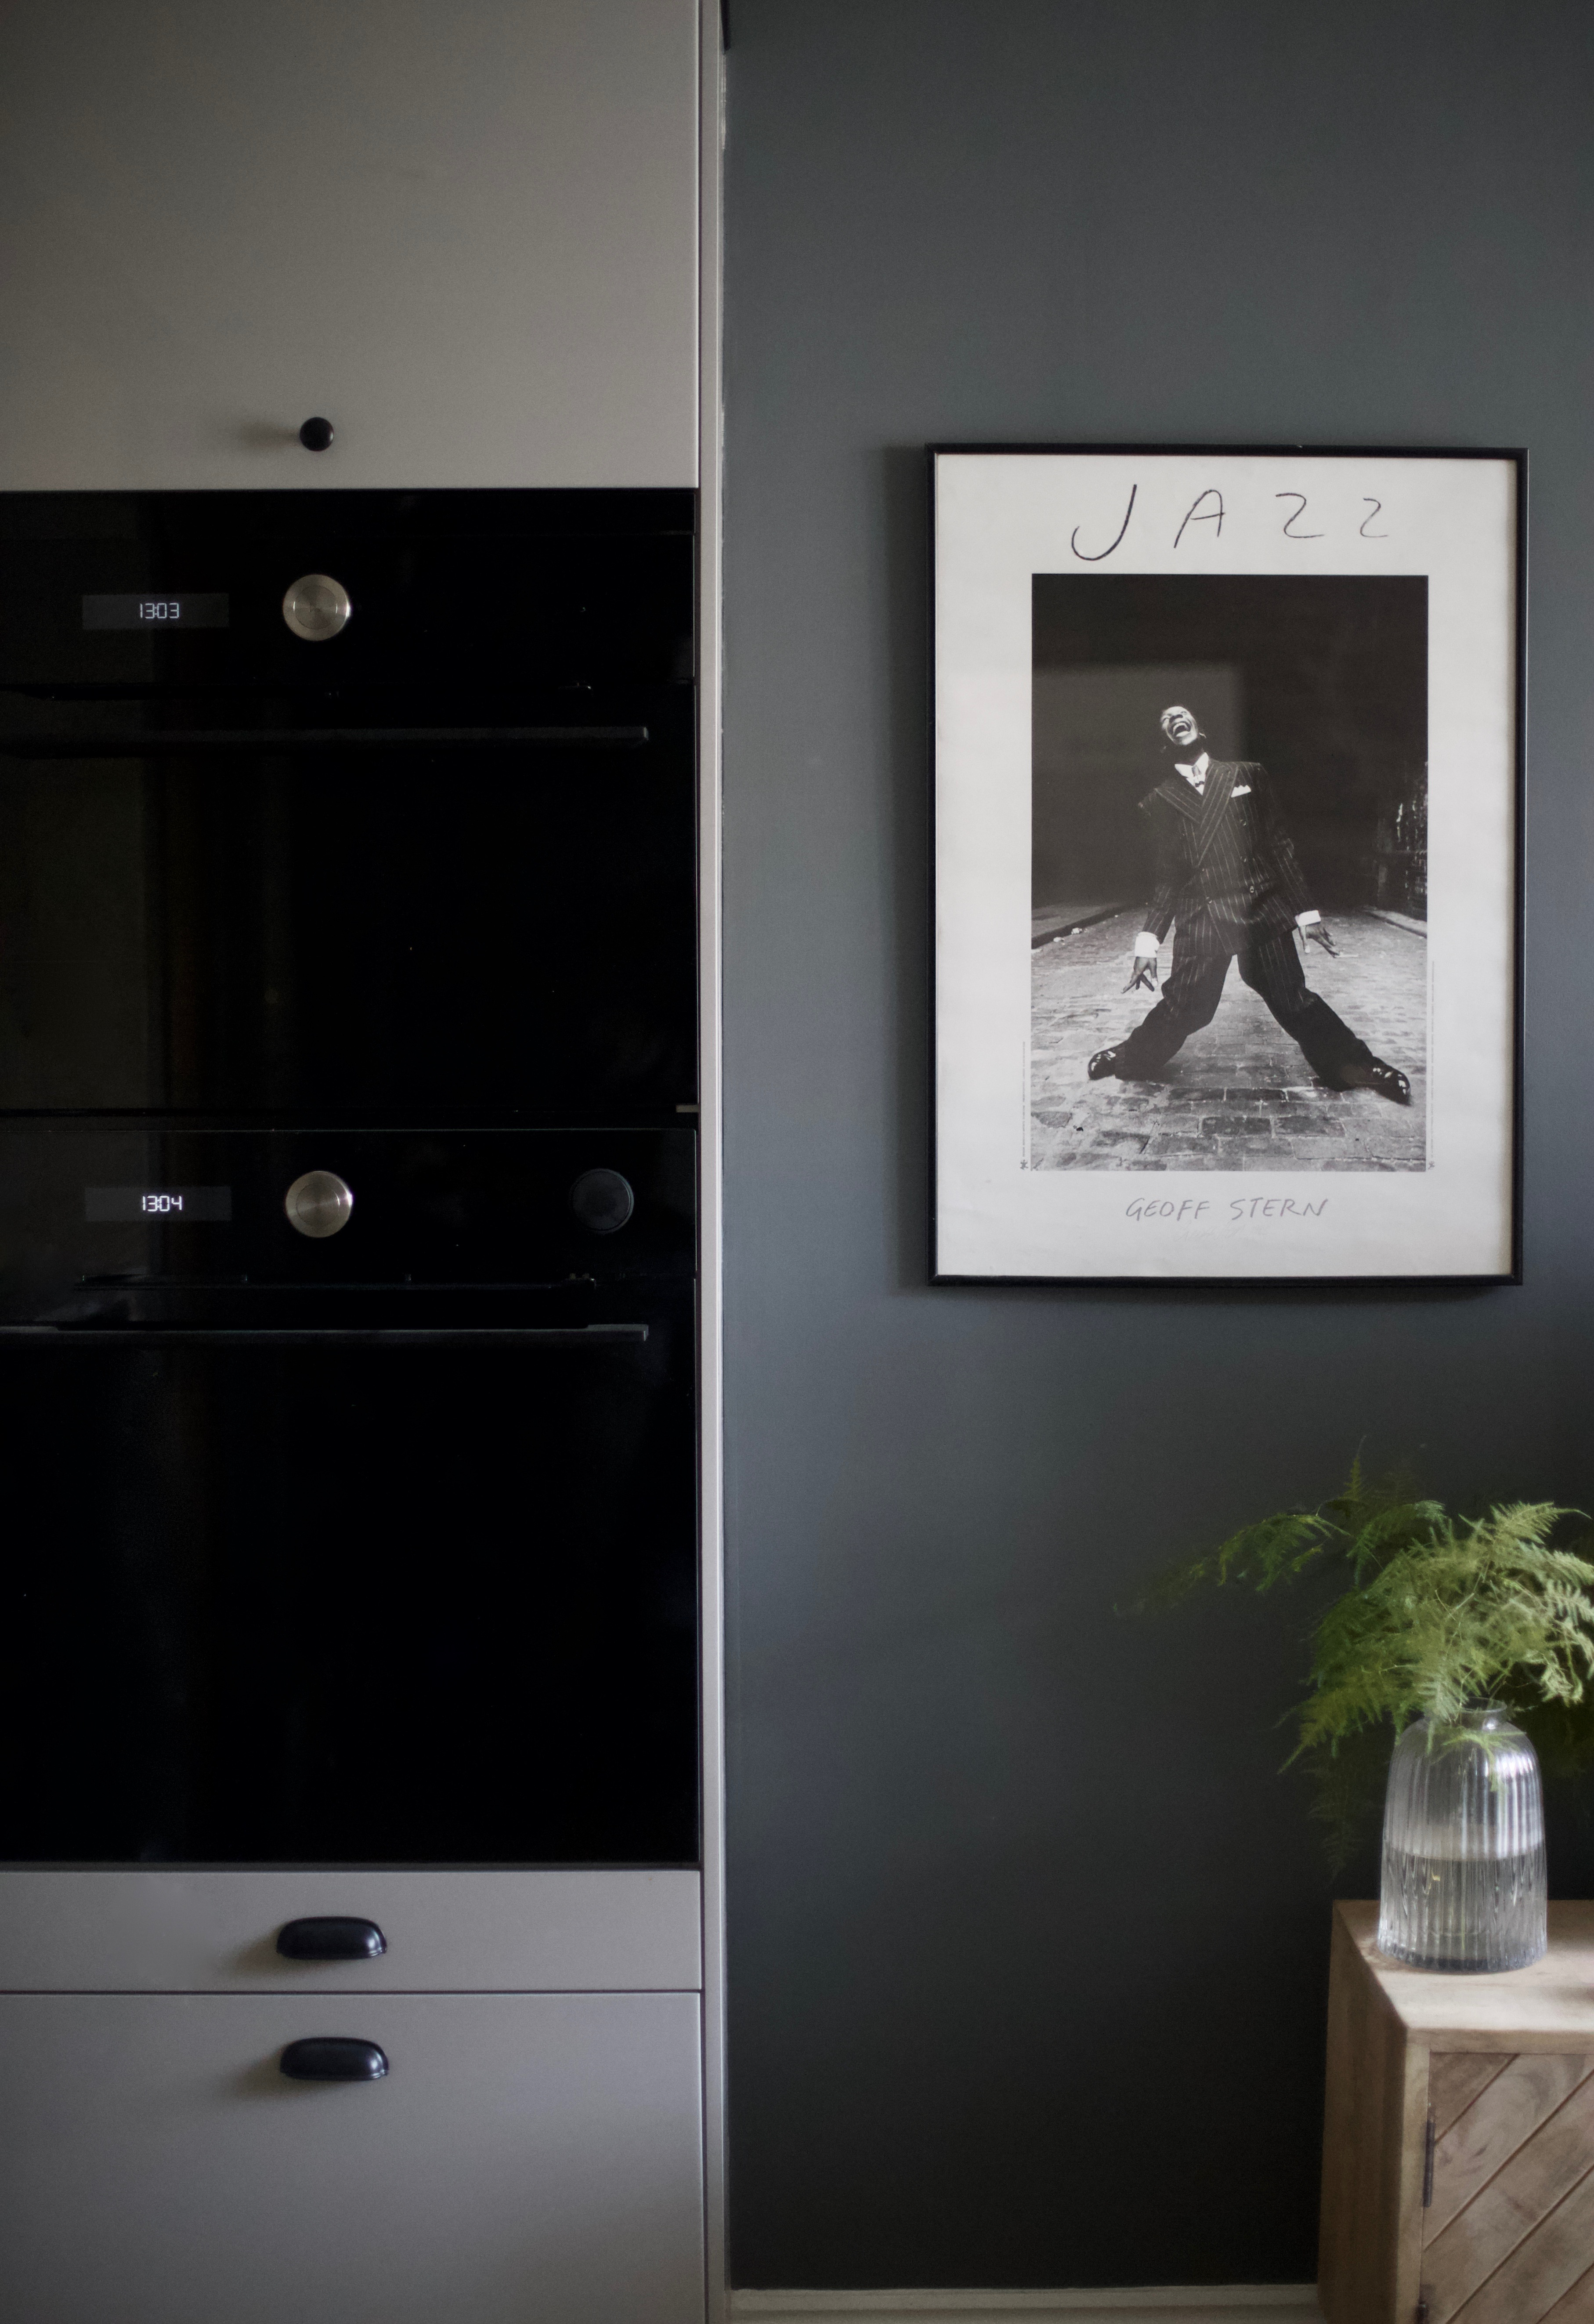 Ikea Oven Cabinet Shot